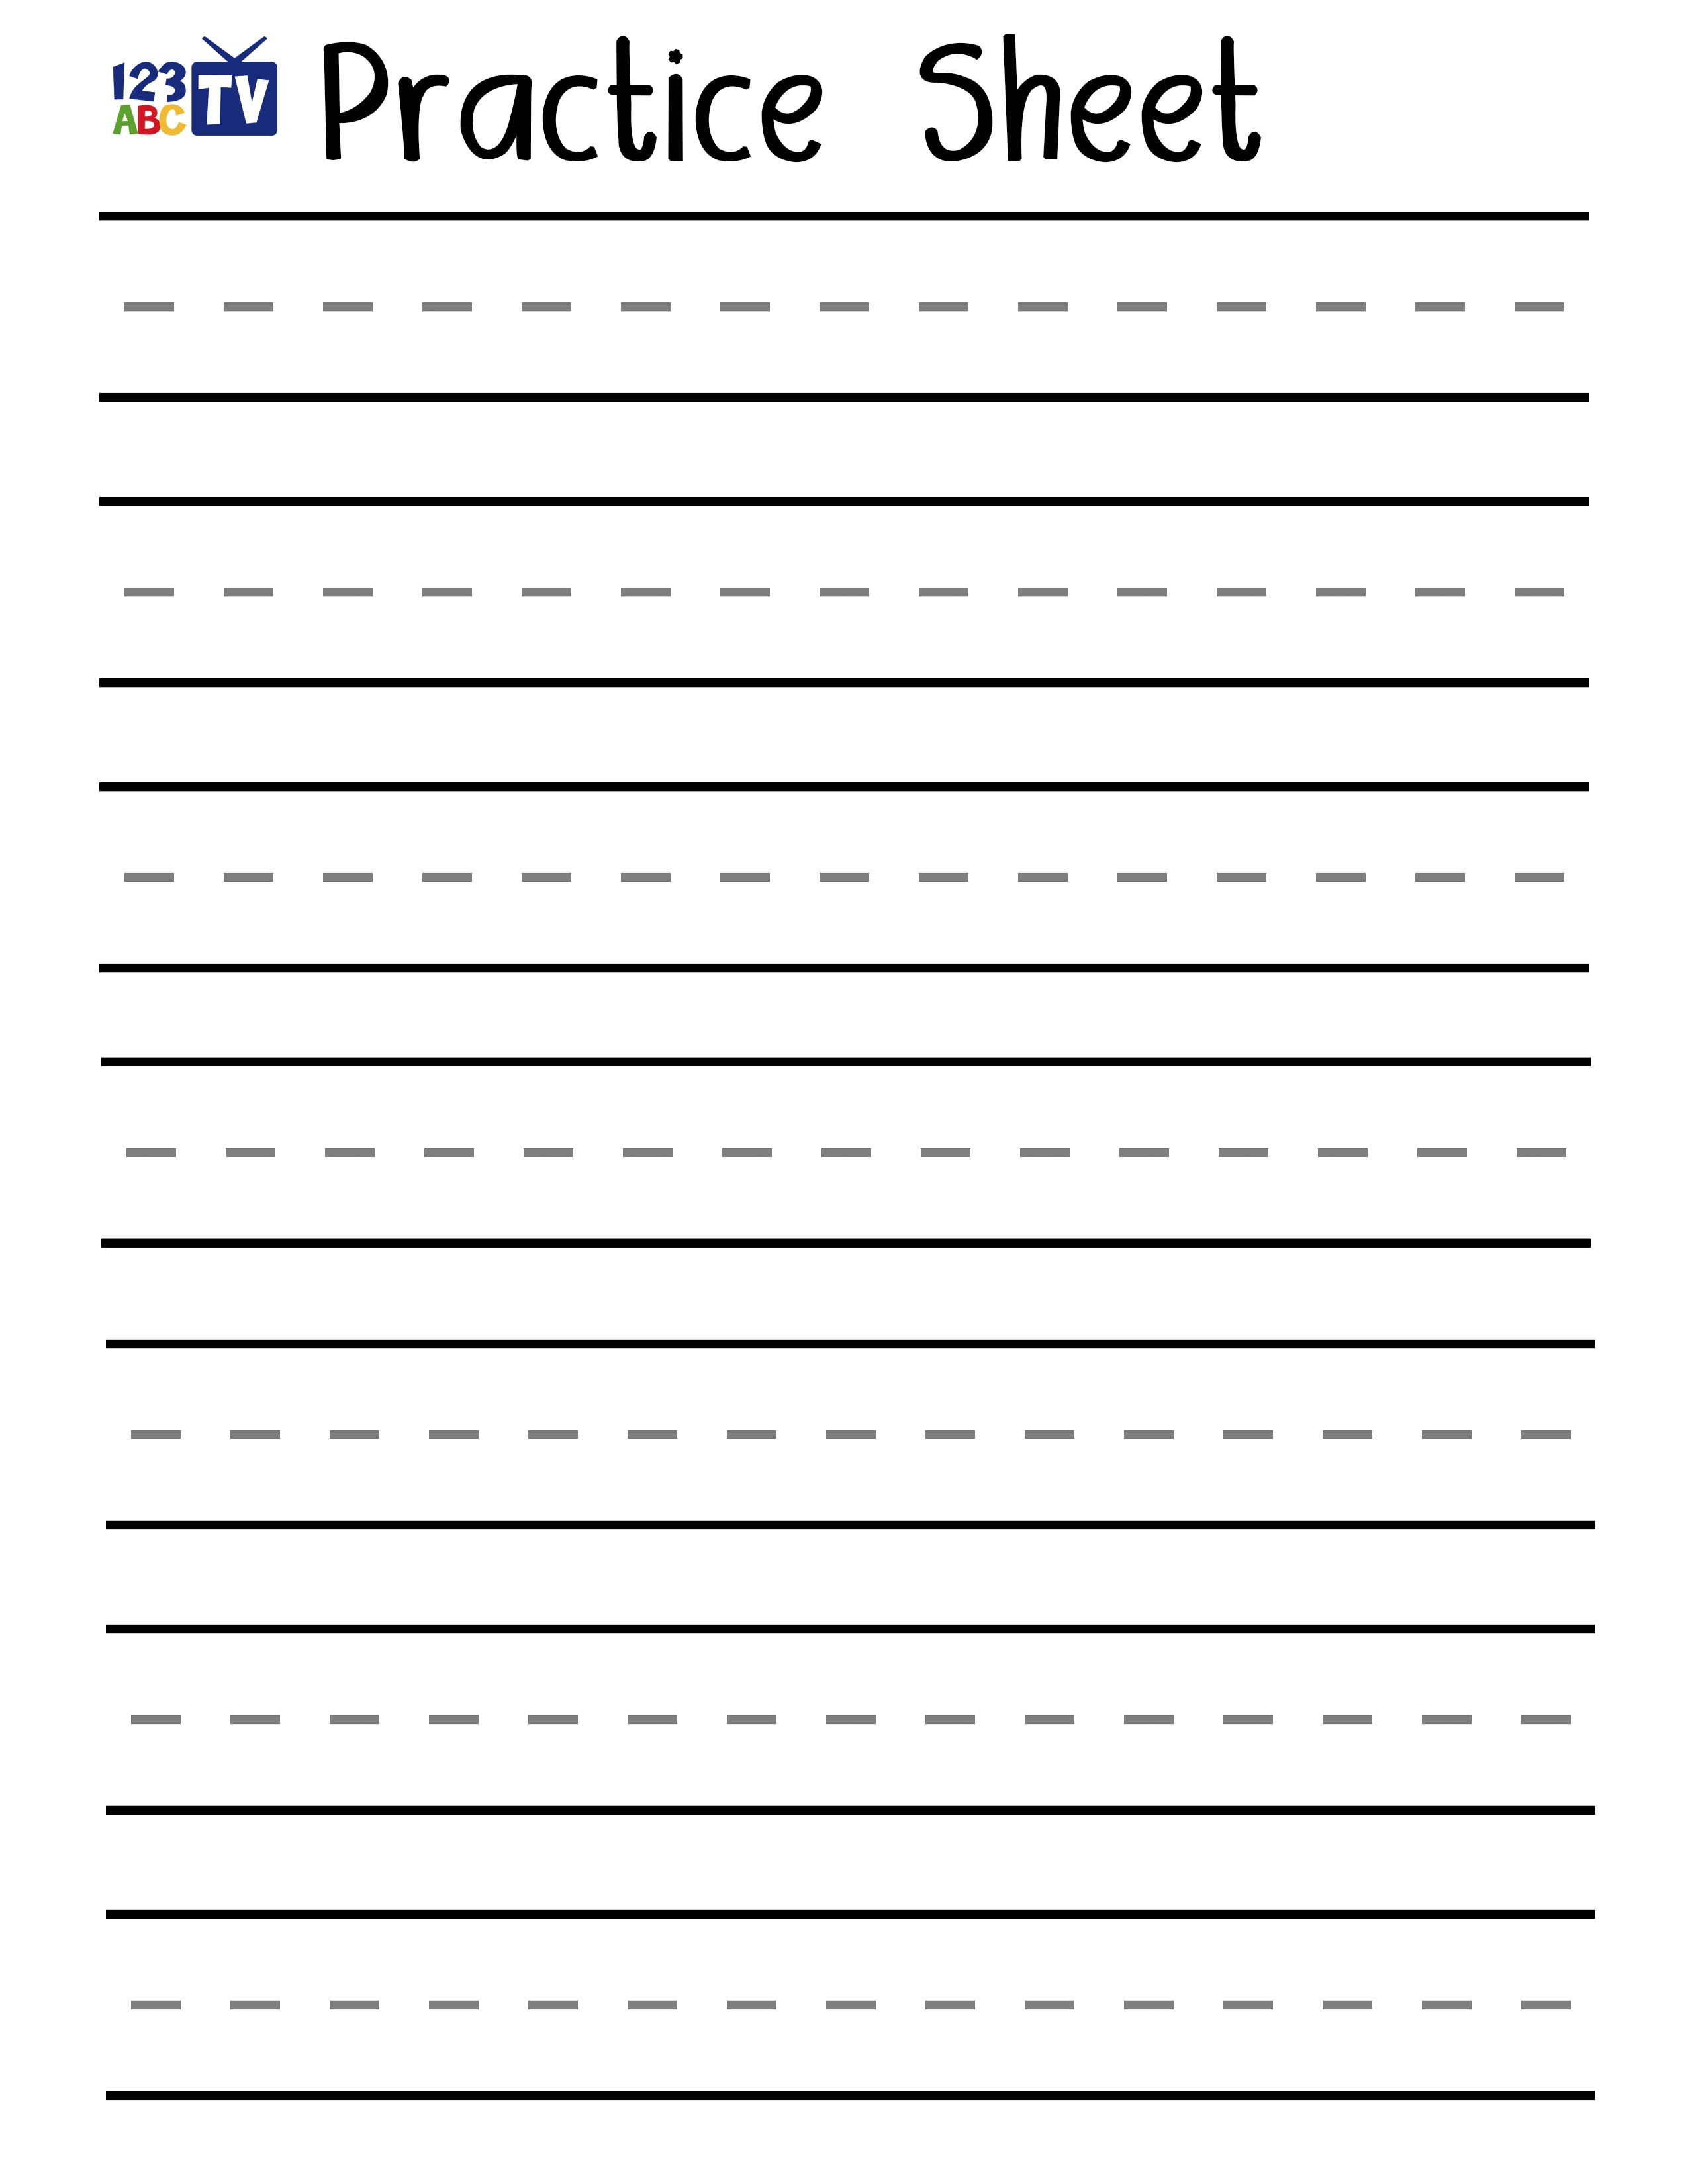 Blank Handwriting Worksheets Pdf Awesome Print Handwriting - Free | Printable Handwriting Worksheets Pdf